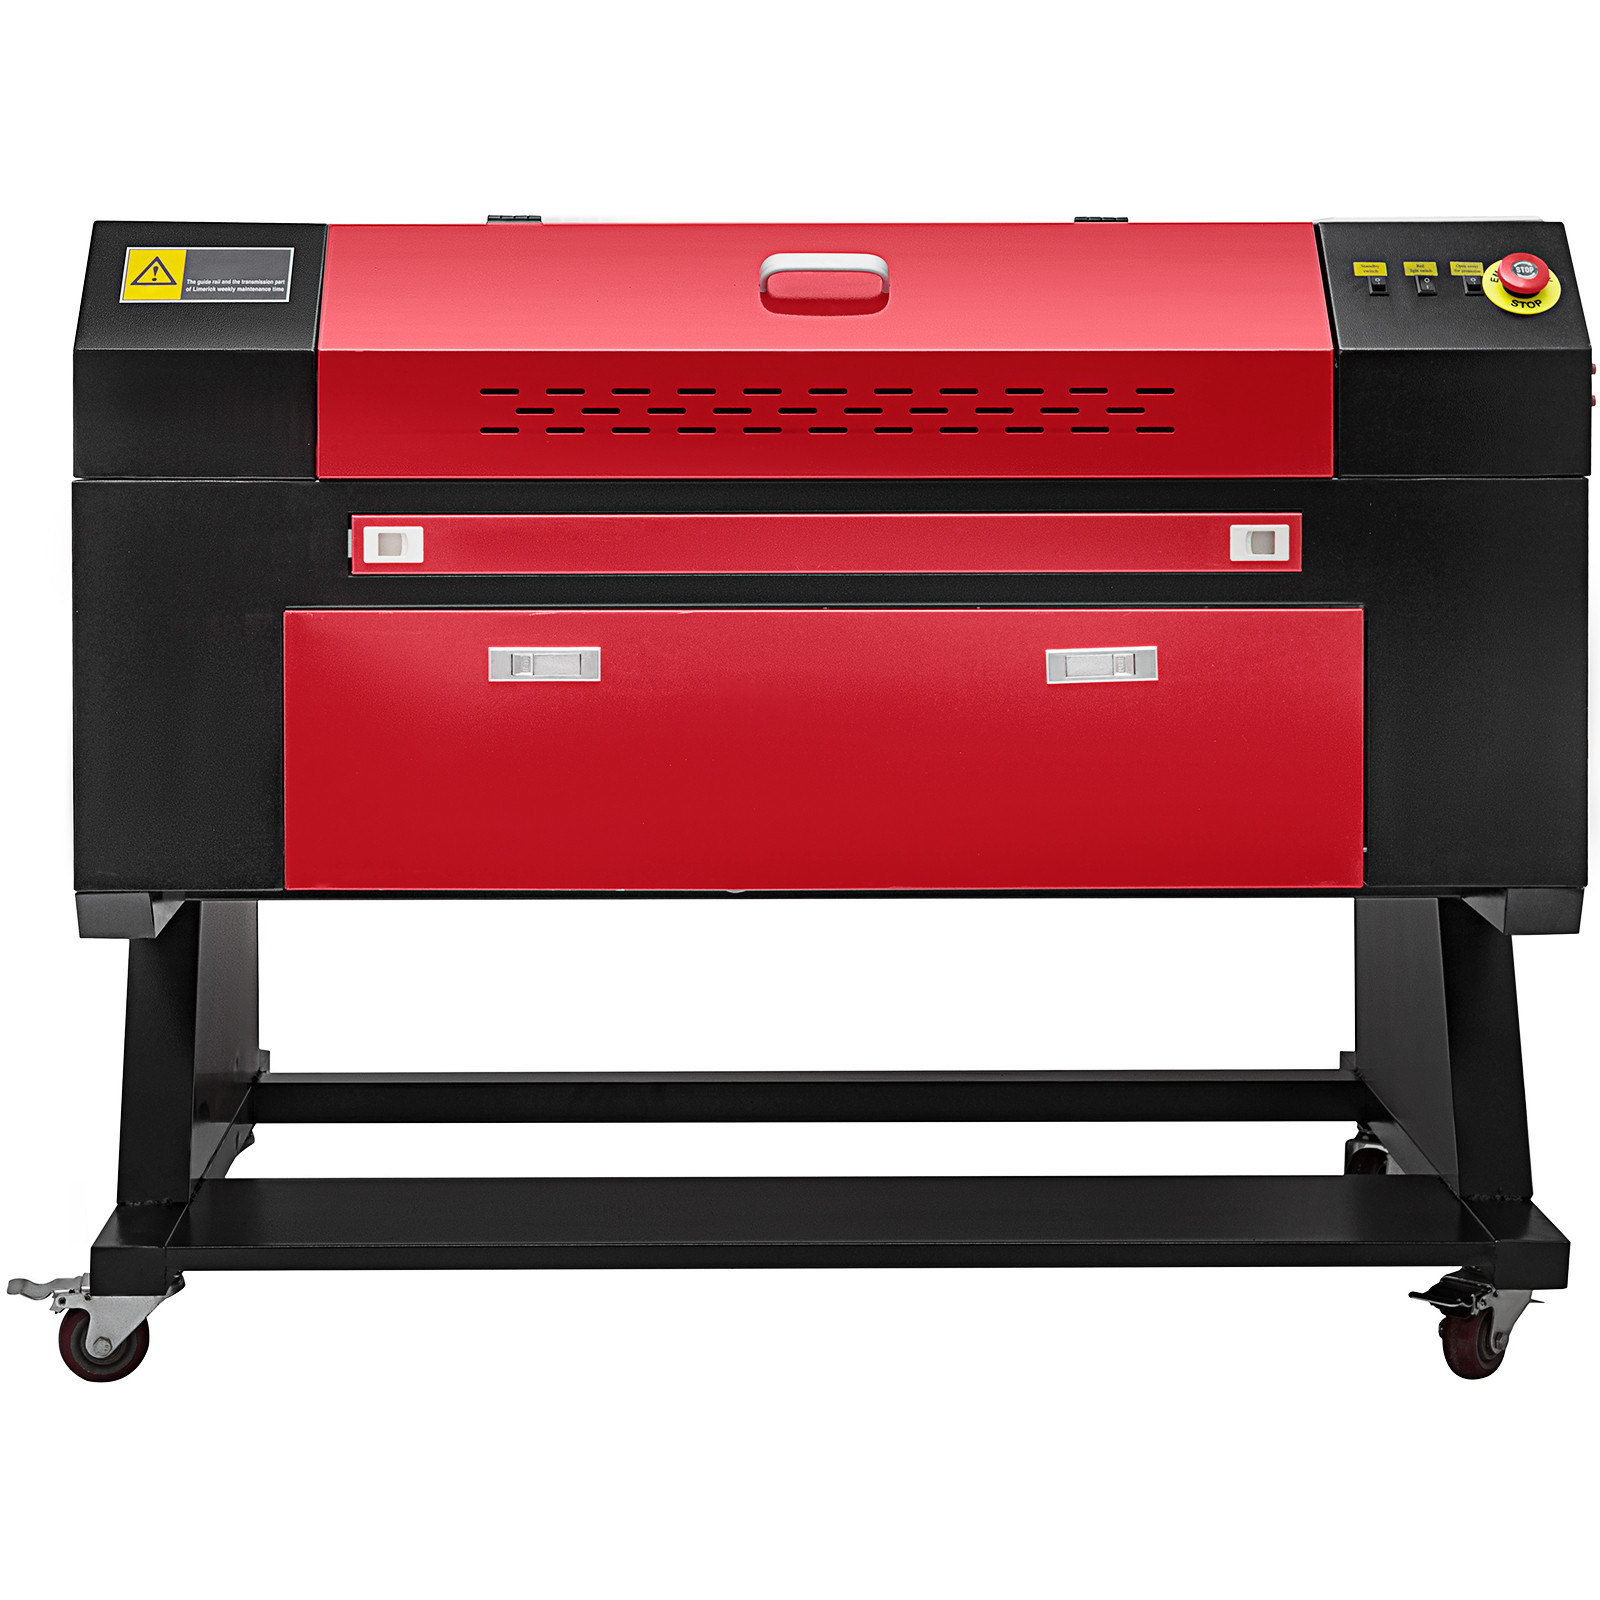 Macchina-per-Incisione-Laser-CO2-40-130W-Asse-Rotante-Tagliatrice-Incisore miniatura 50